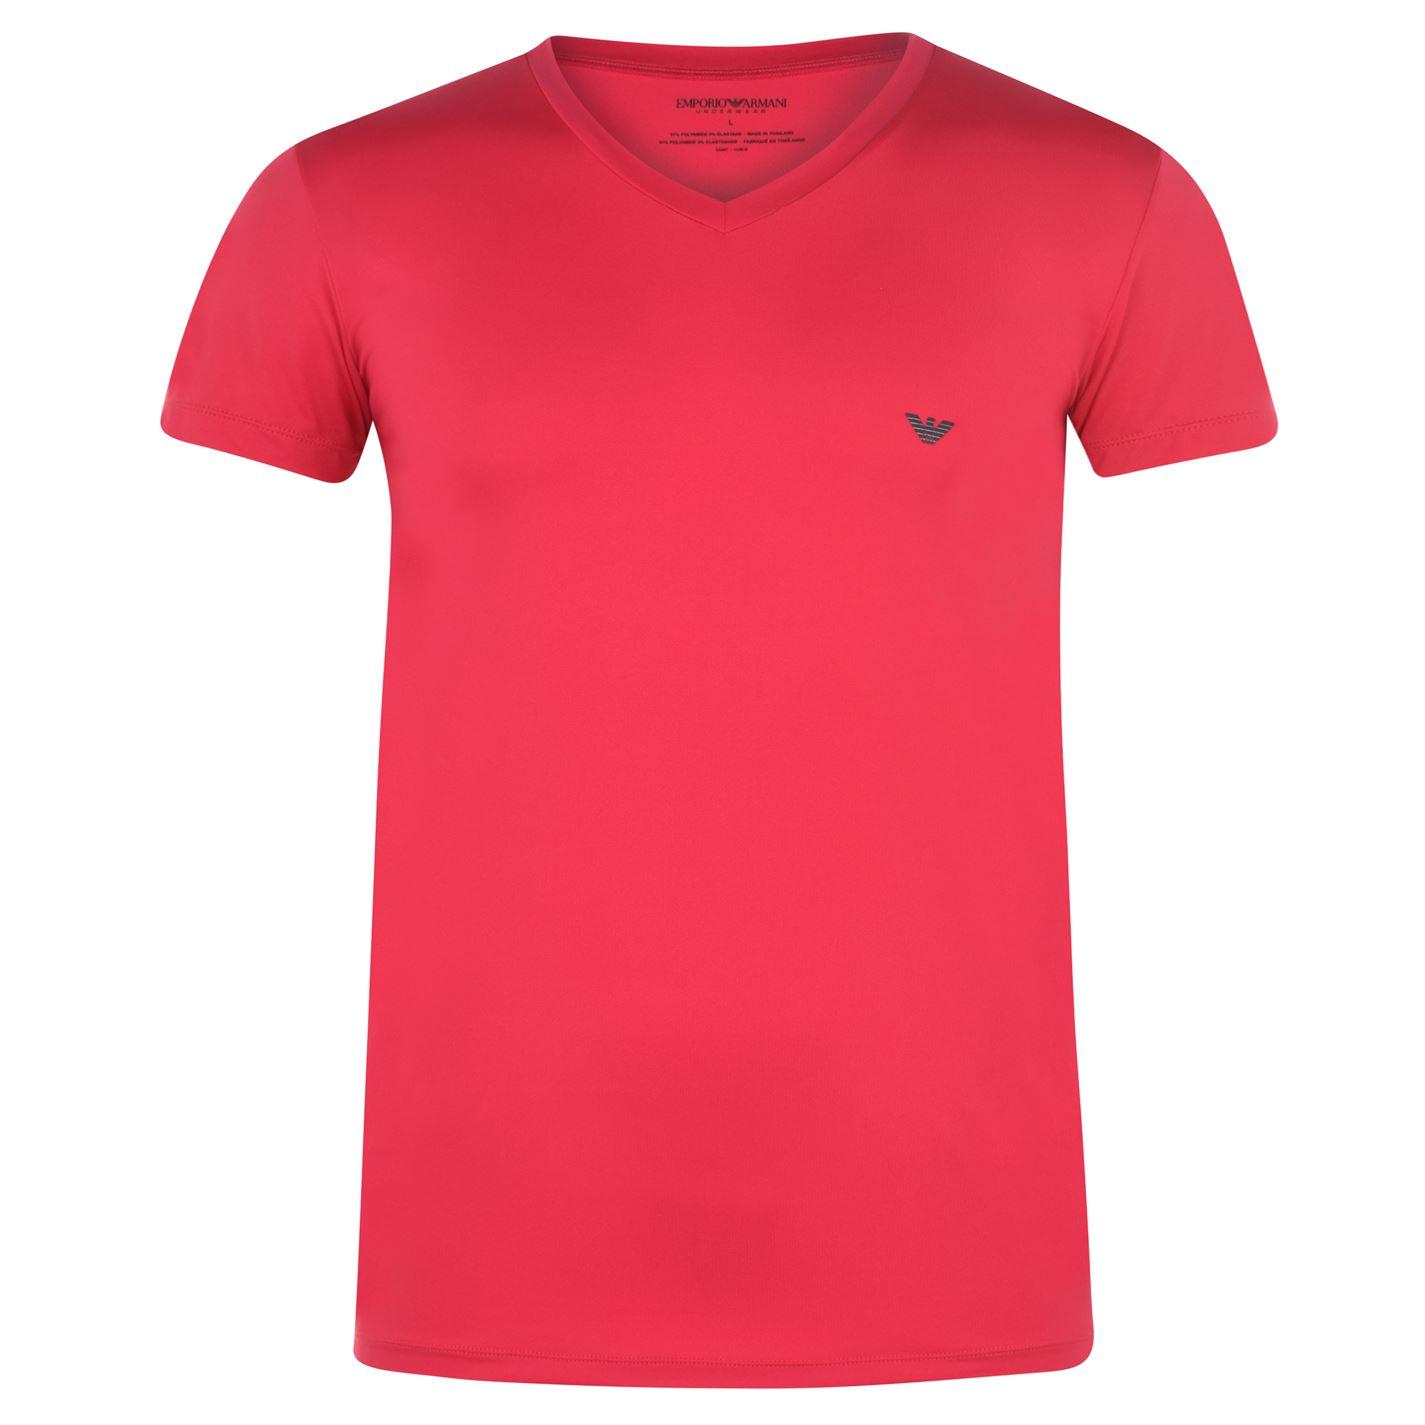 Emporio Armani Armani T Shirt Mens